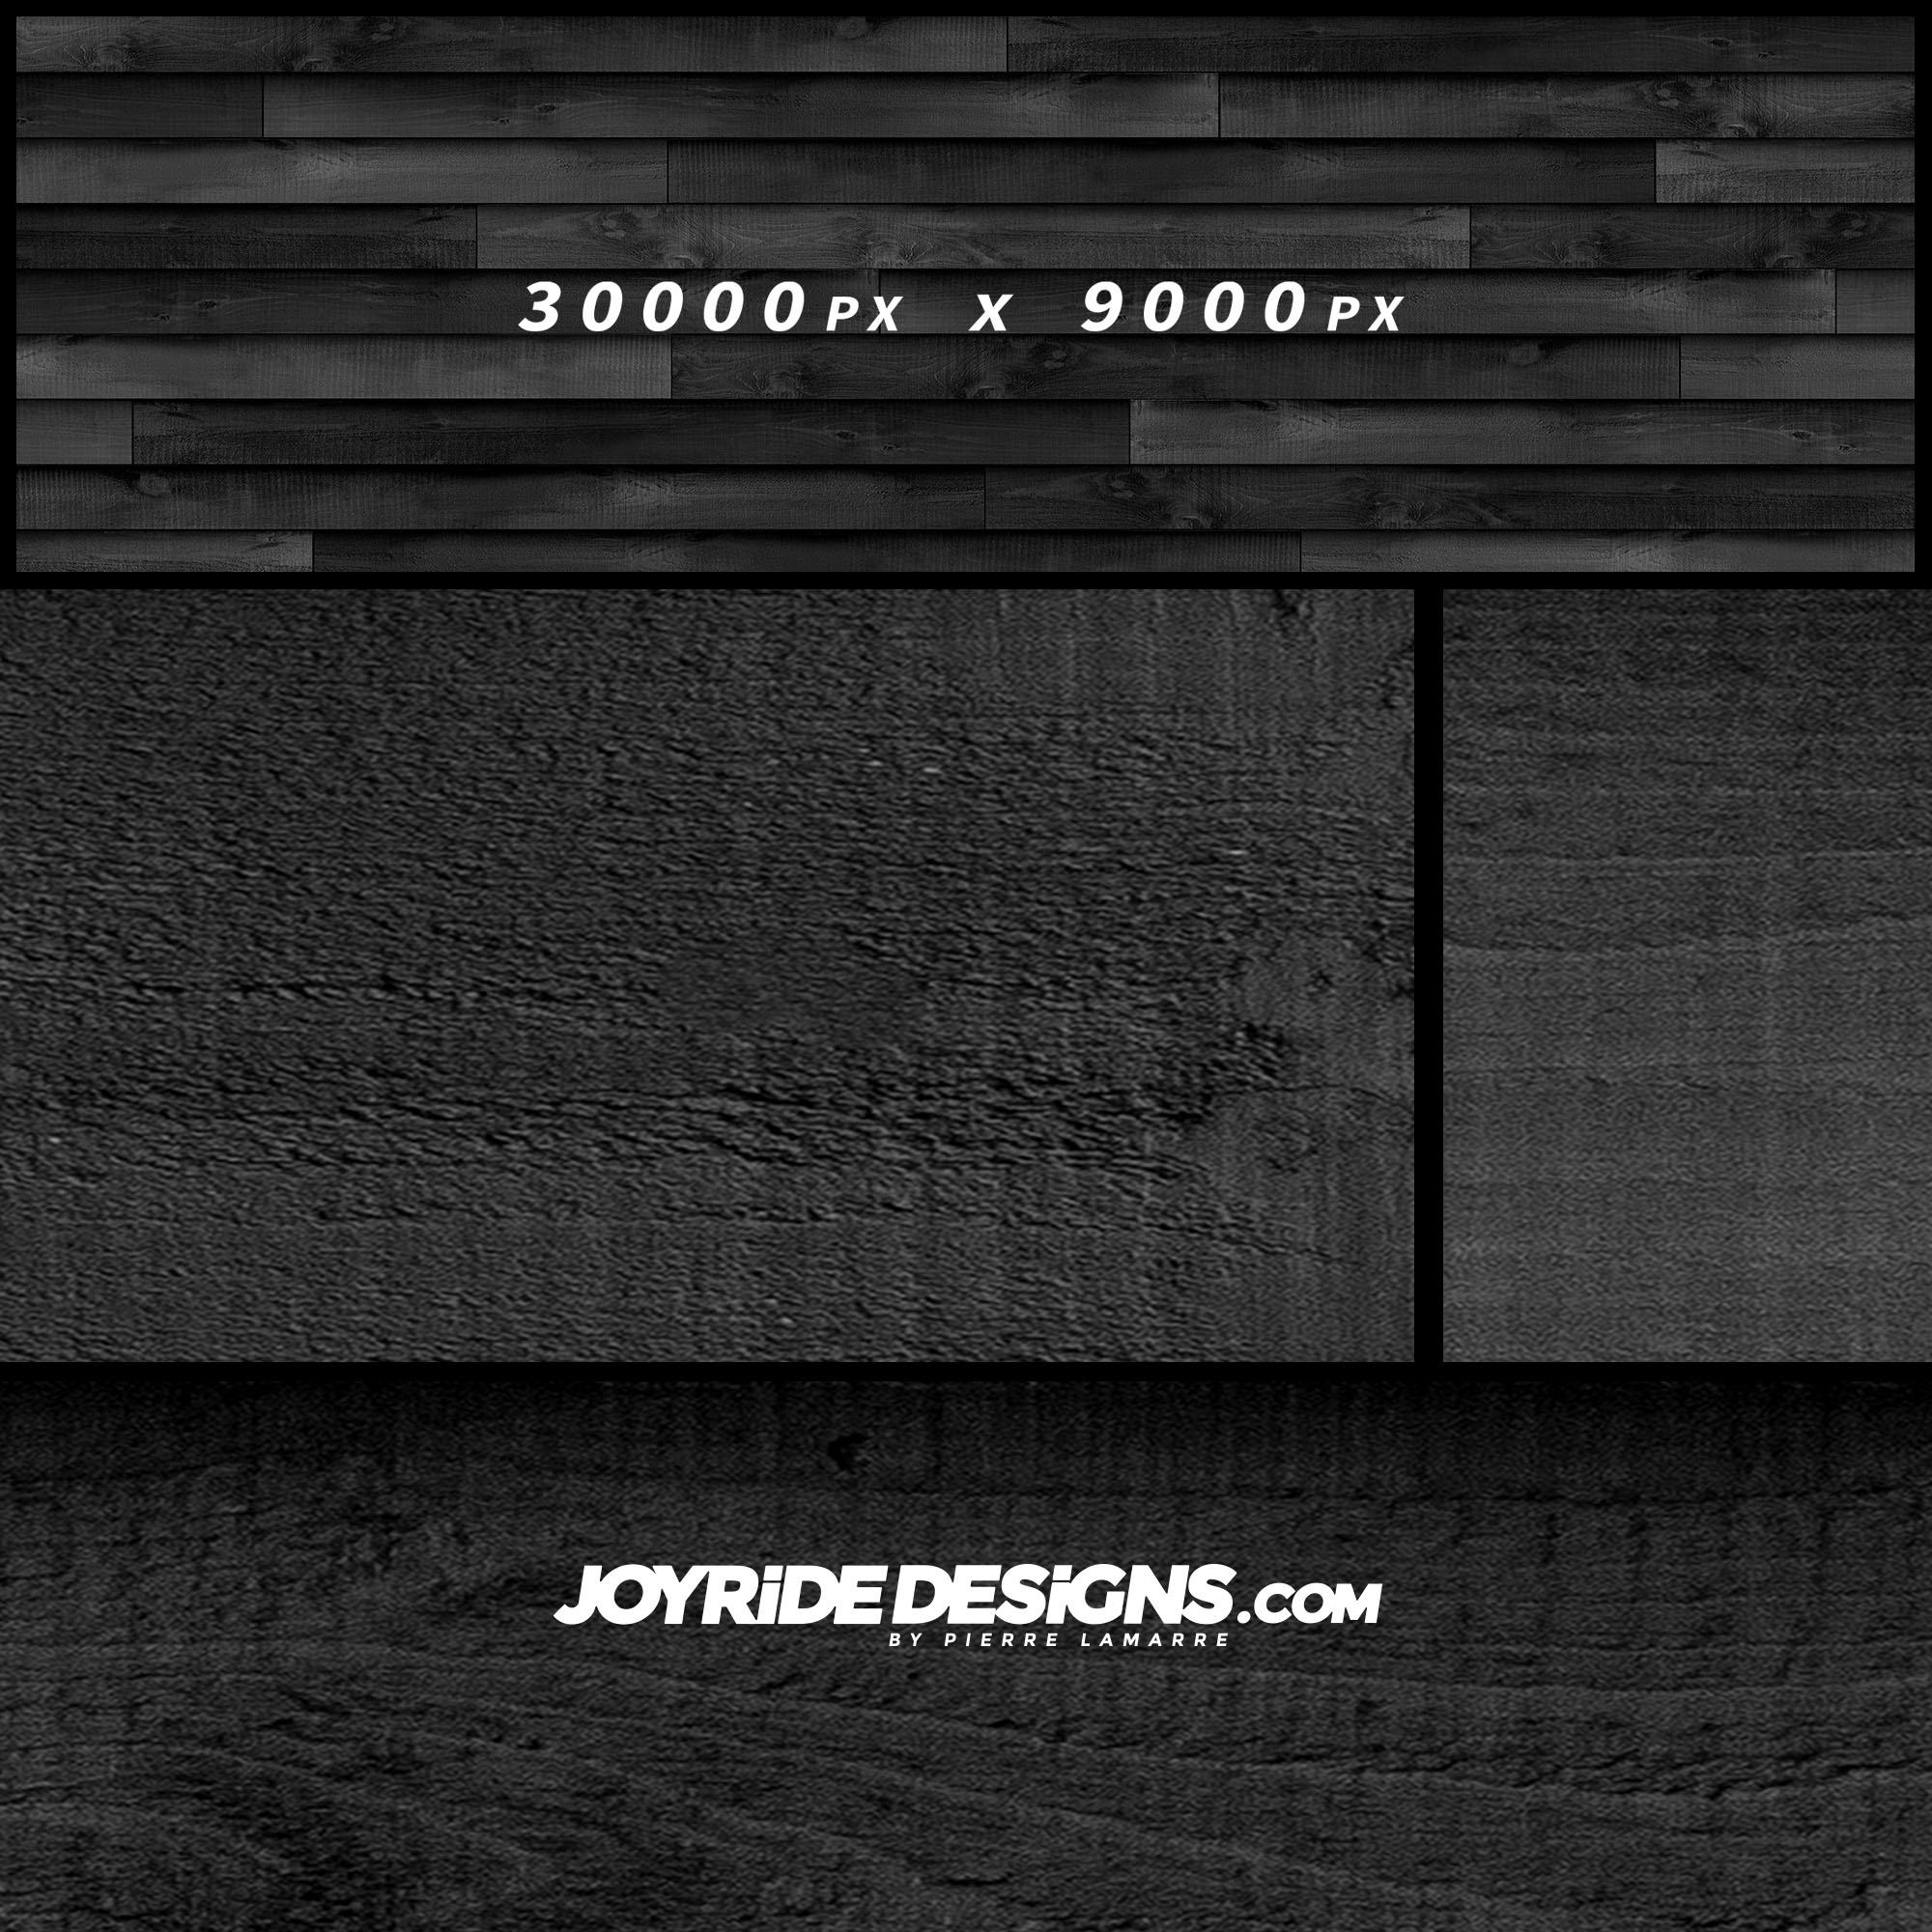 JOYRIDE BLACK WOOD TEXTURE WRAP DESIGN JDT-09